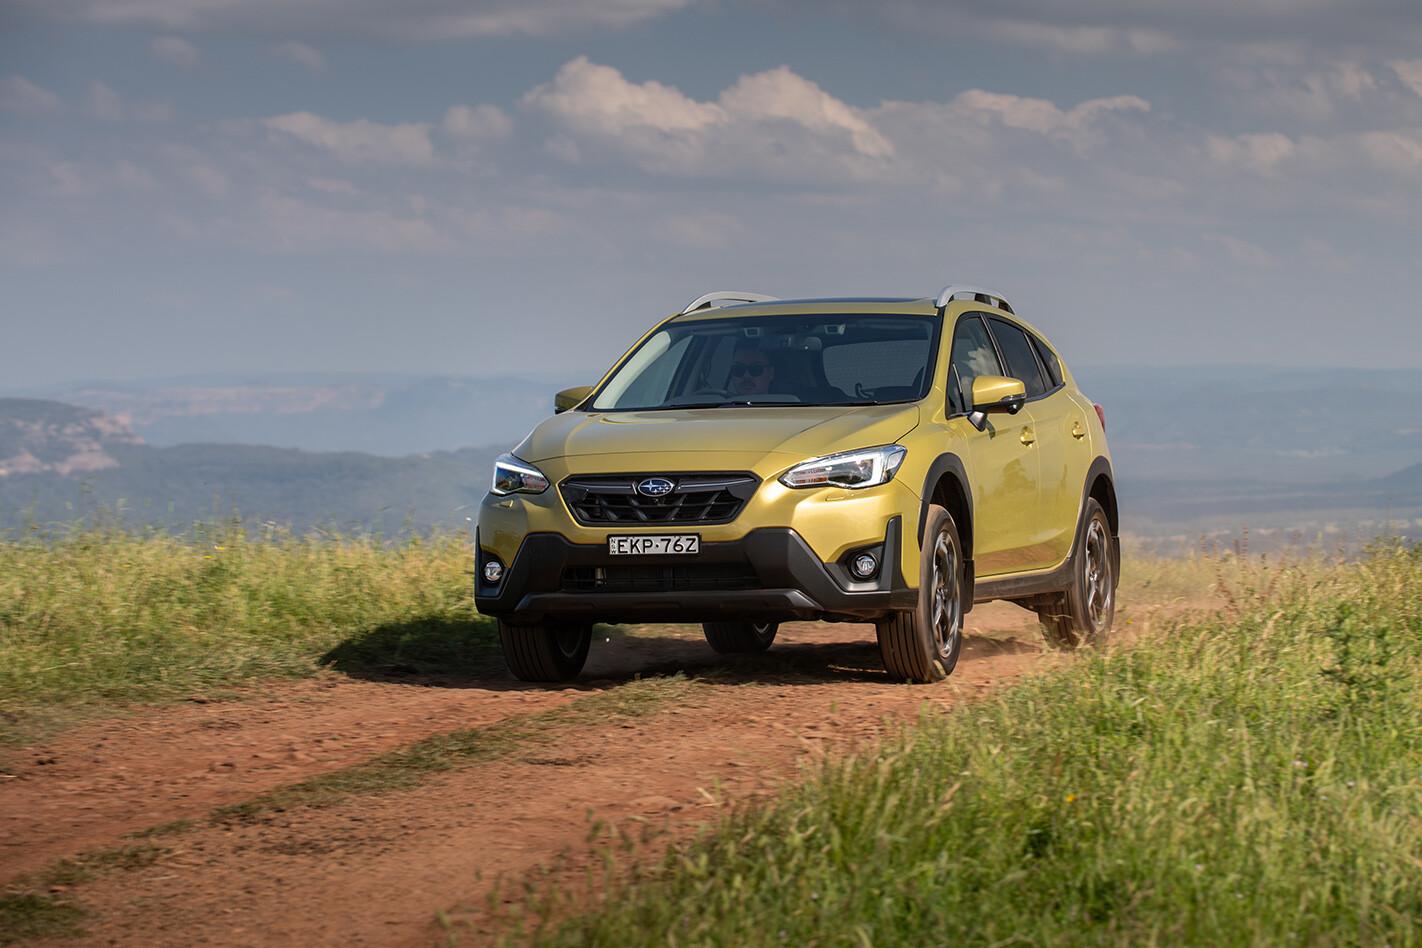 2021 Subaru XV 2.0i-S review